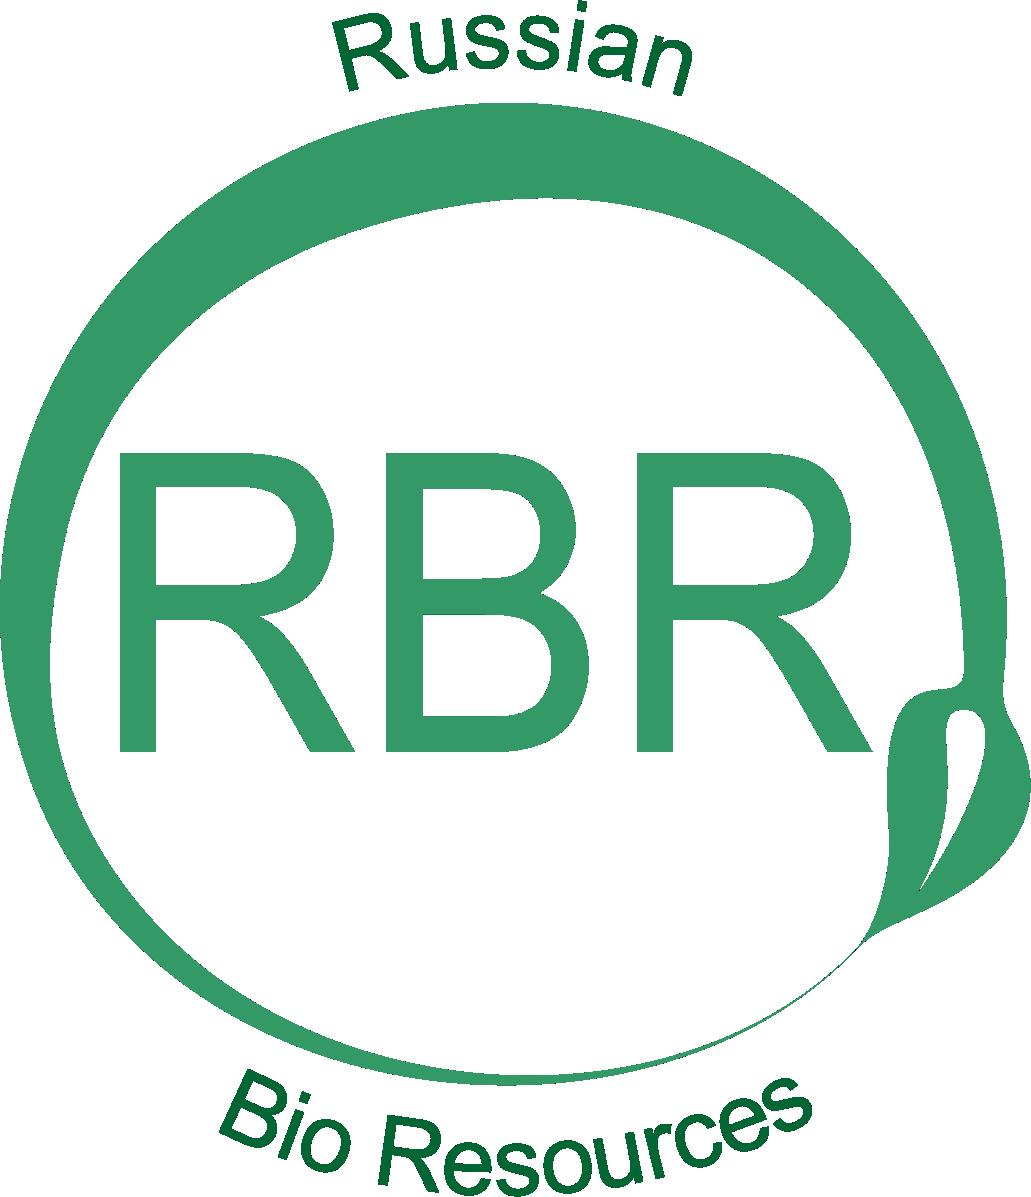 Разработка логотипа для компании «Русские Био Ресурсы» фото f_40158f66ed2441ba.png